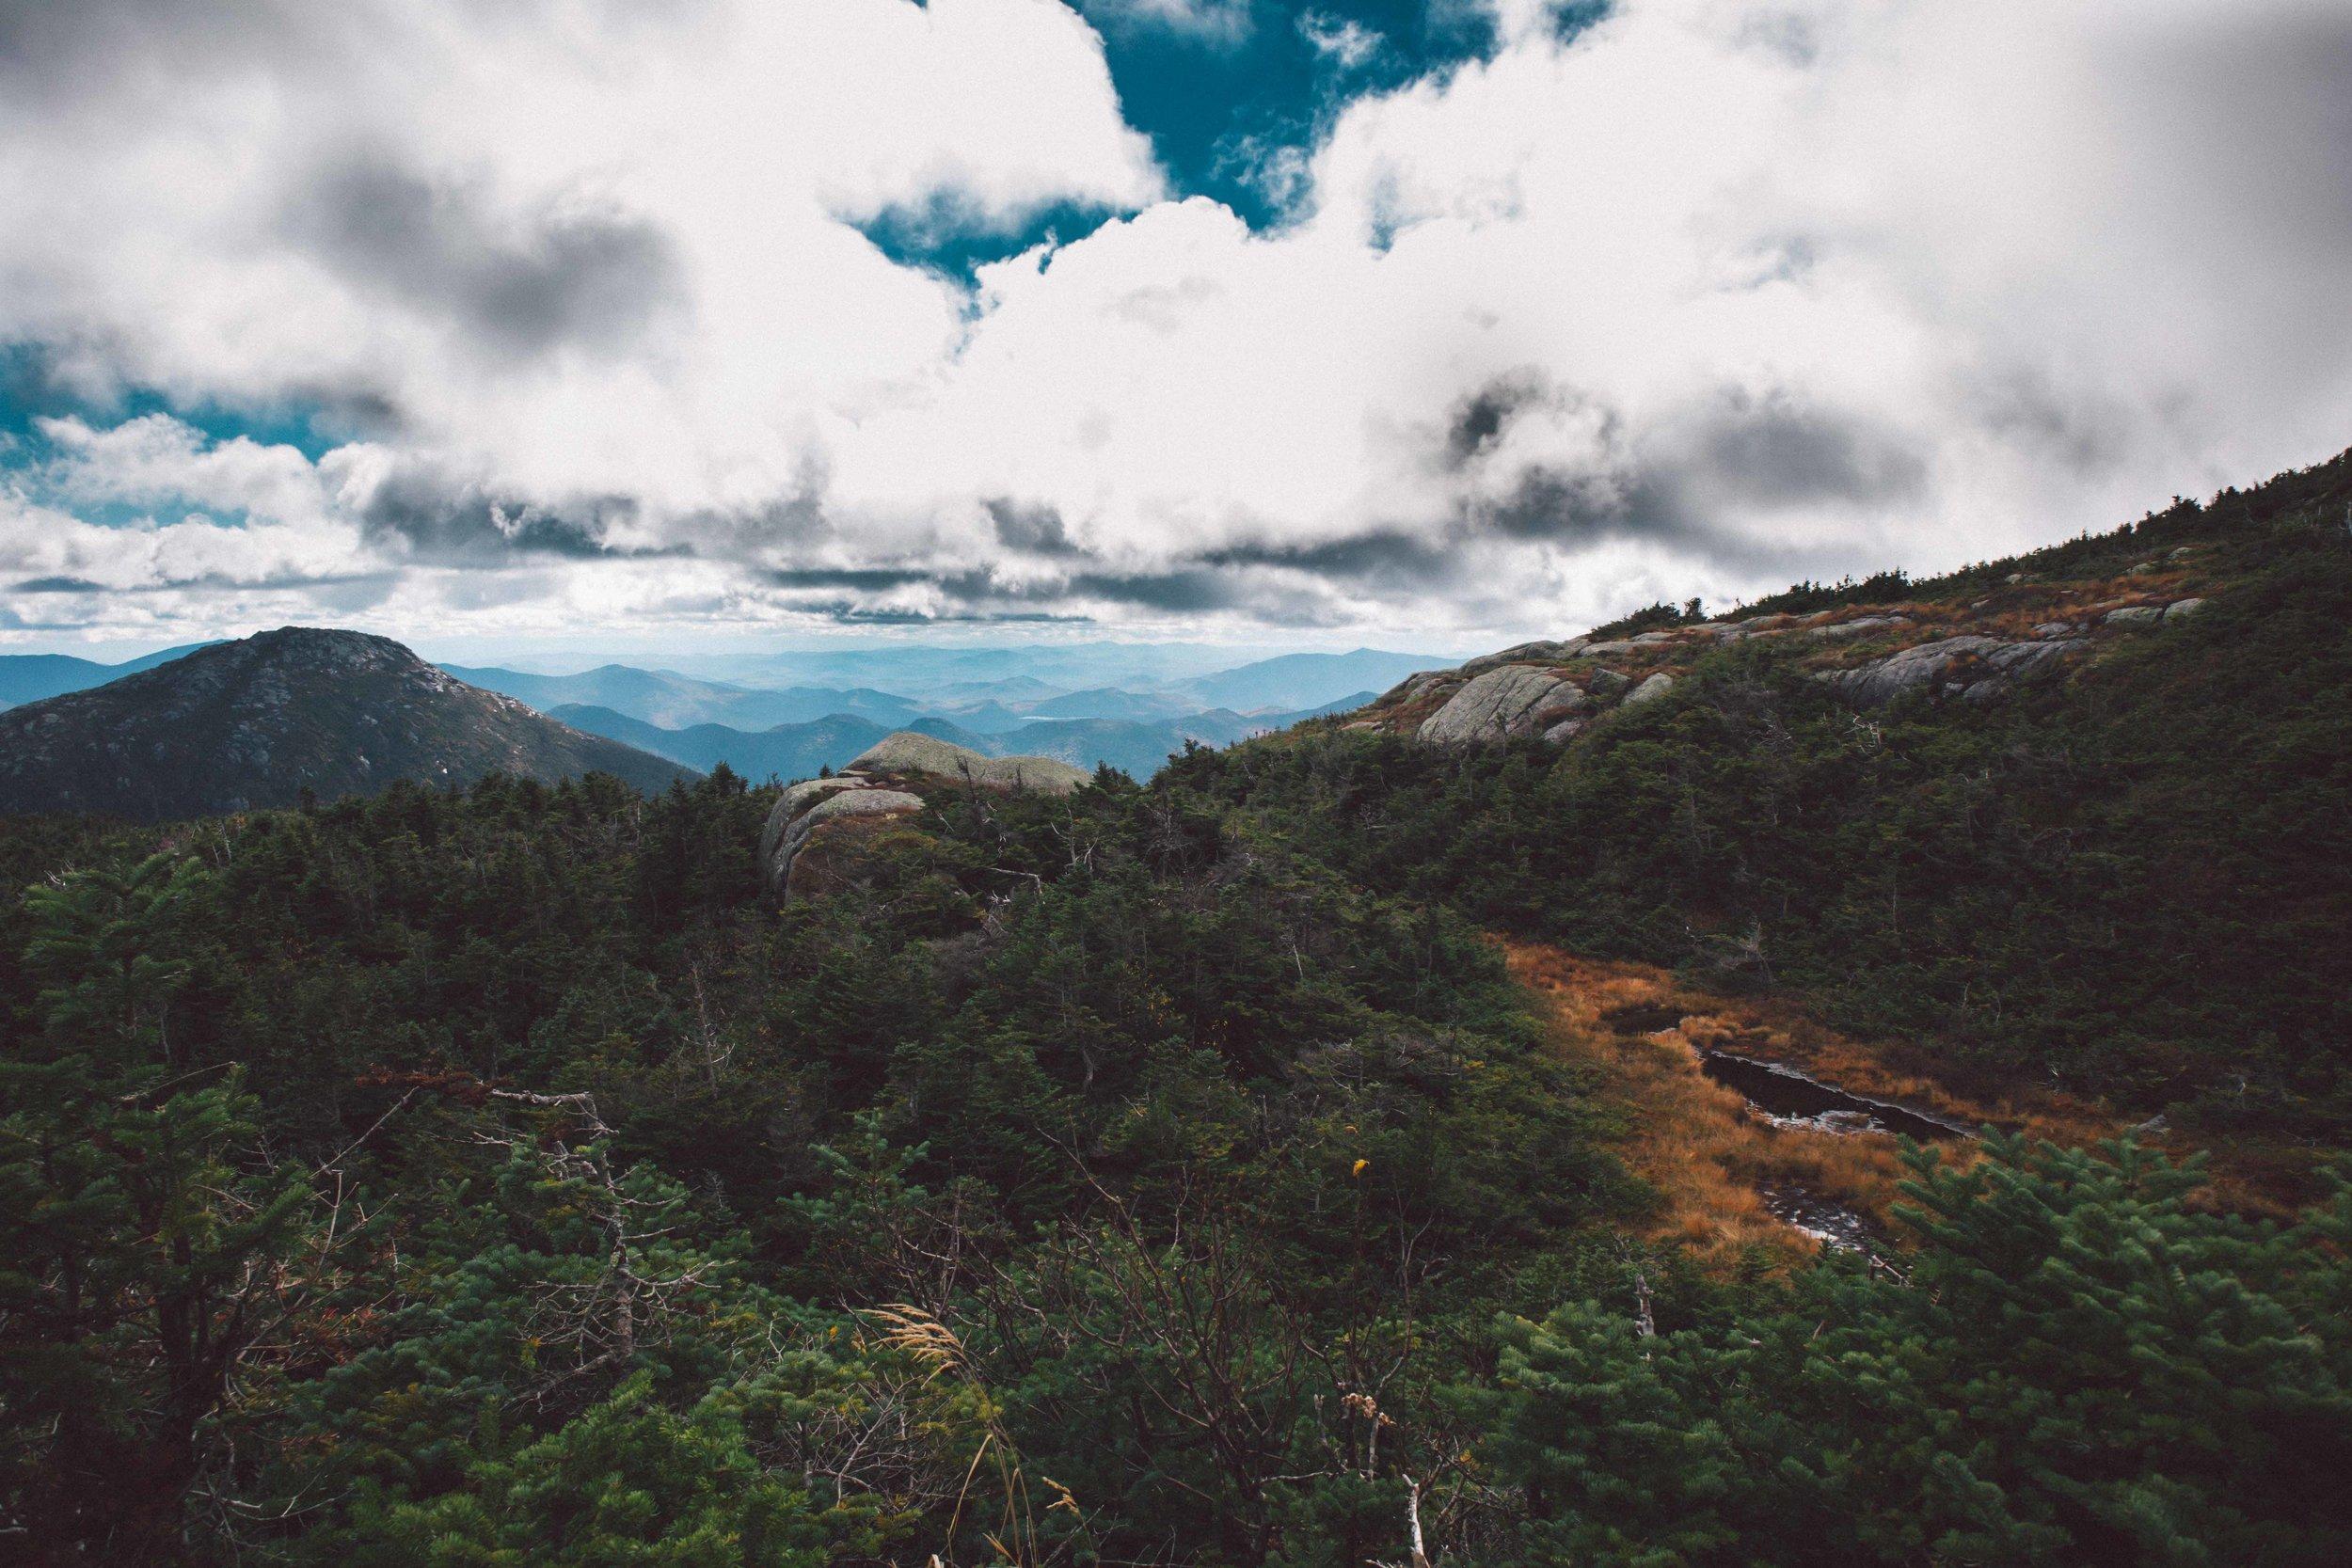 Adirondacks-2018-web-95-Mount-Marcy.jpg